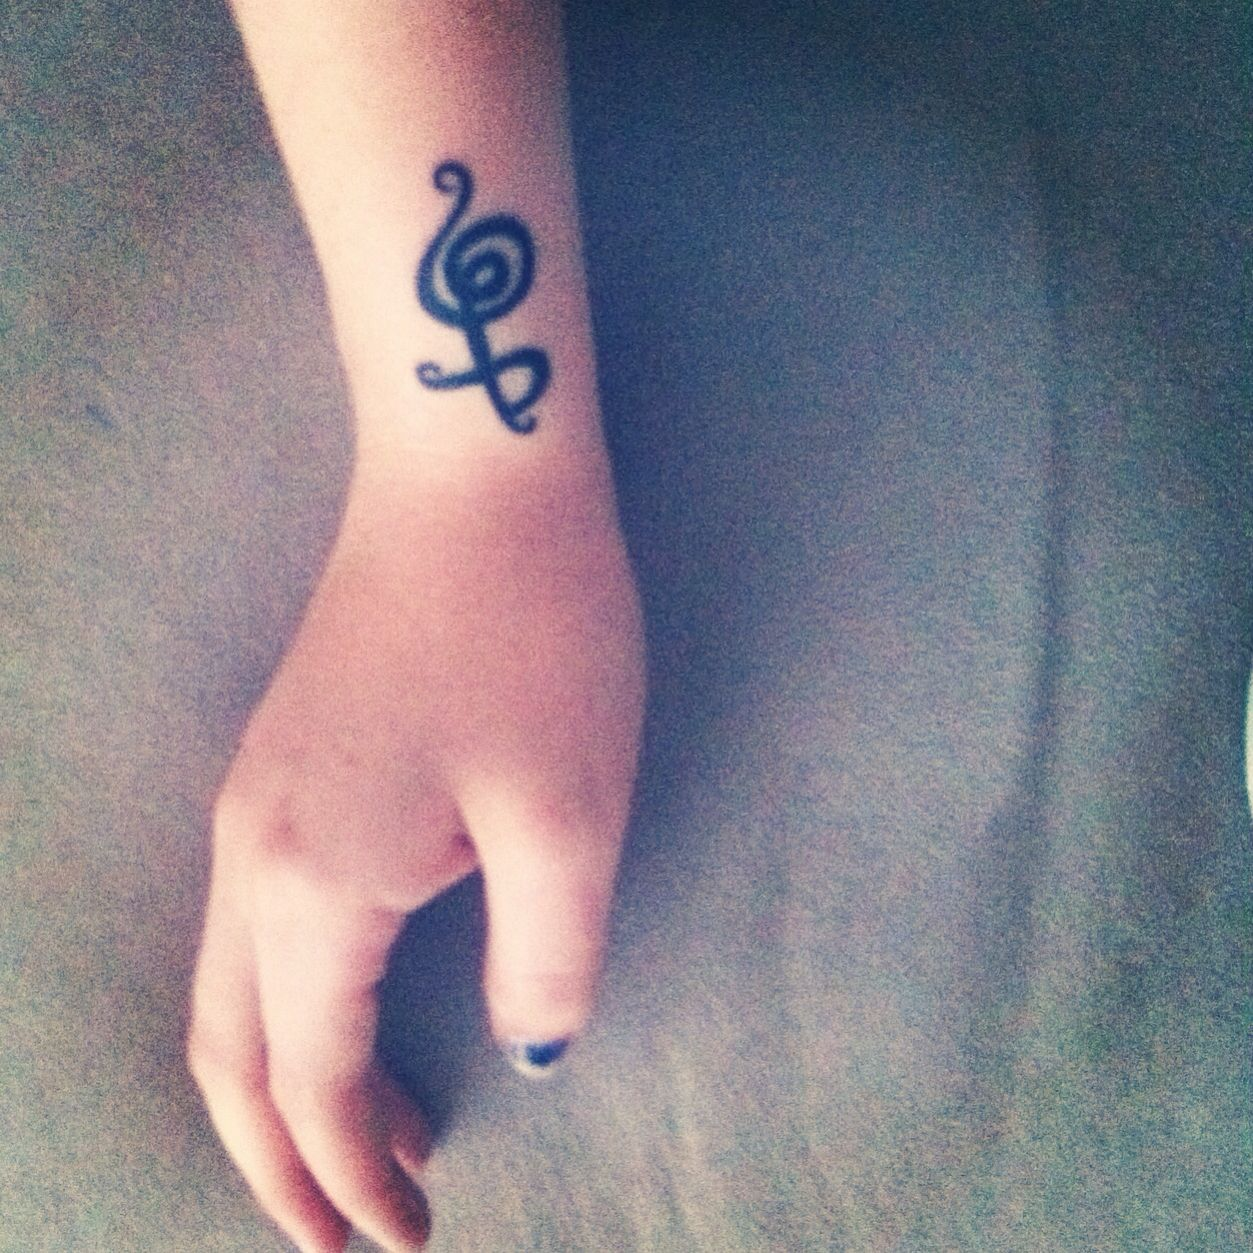 Hakuna matata tattoo tattoos are art too pinterest - Hakuna matata tatouage ...